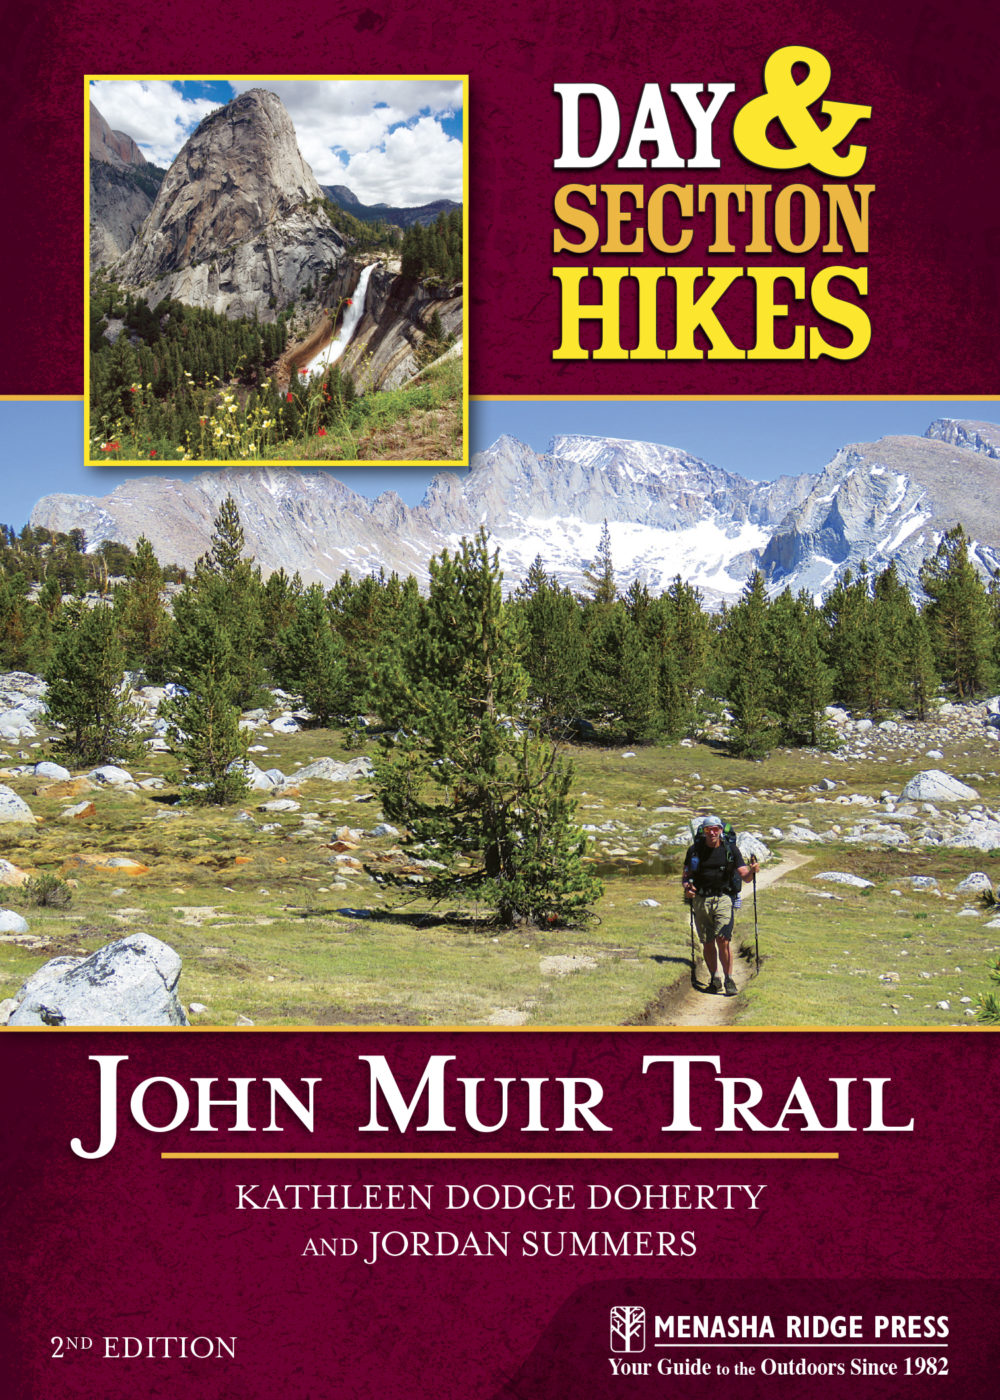 John Muir Trail, section hiking the JMT